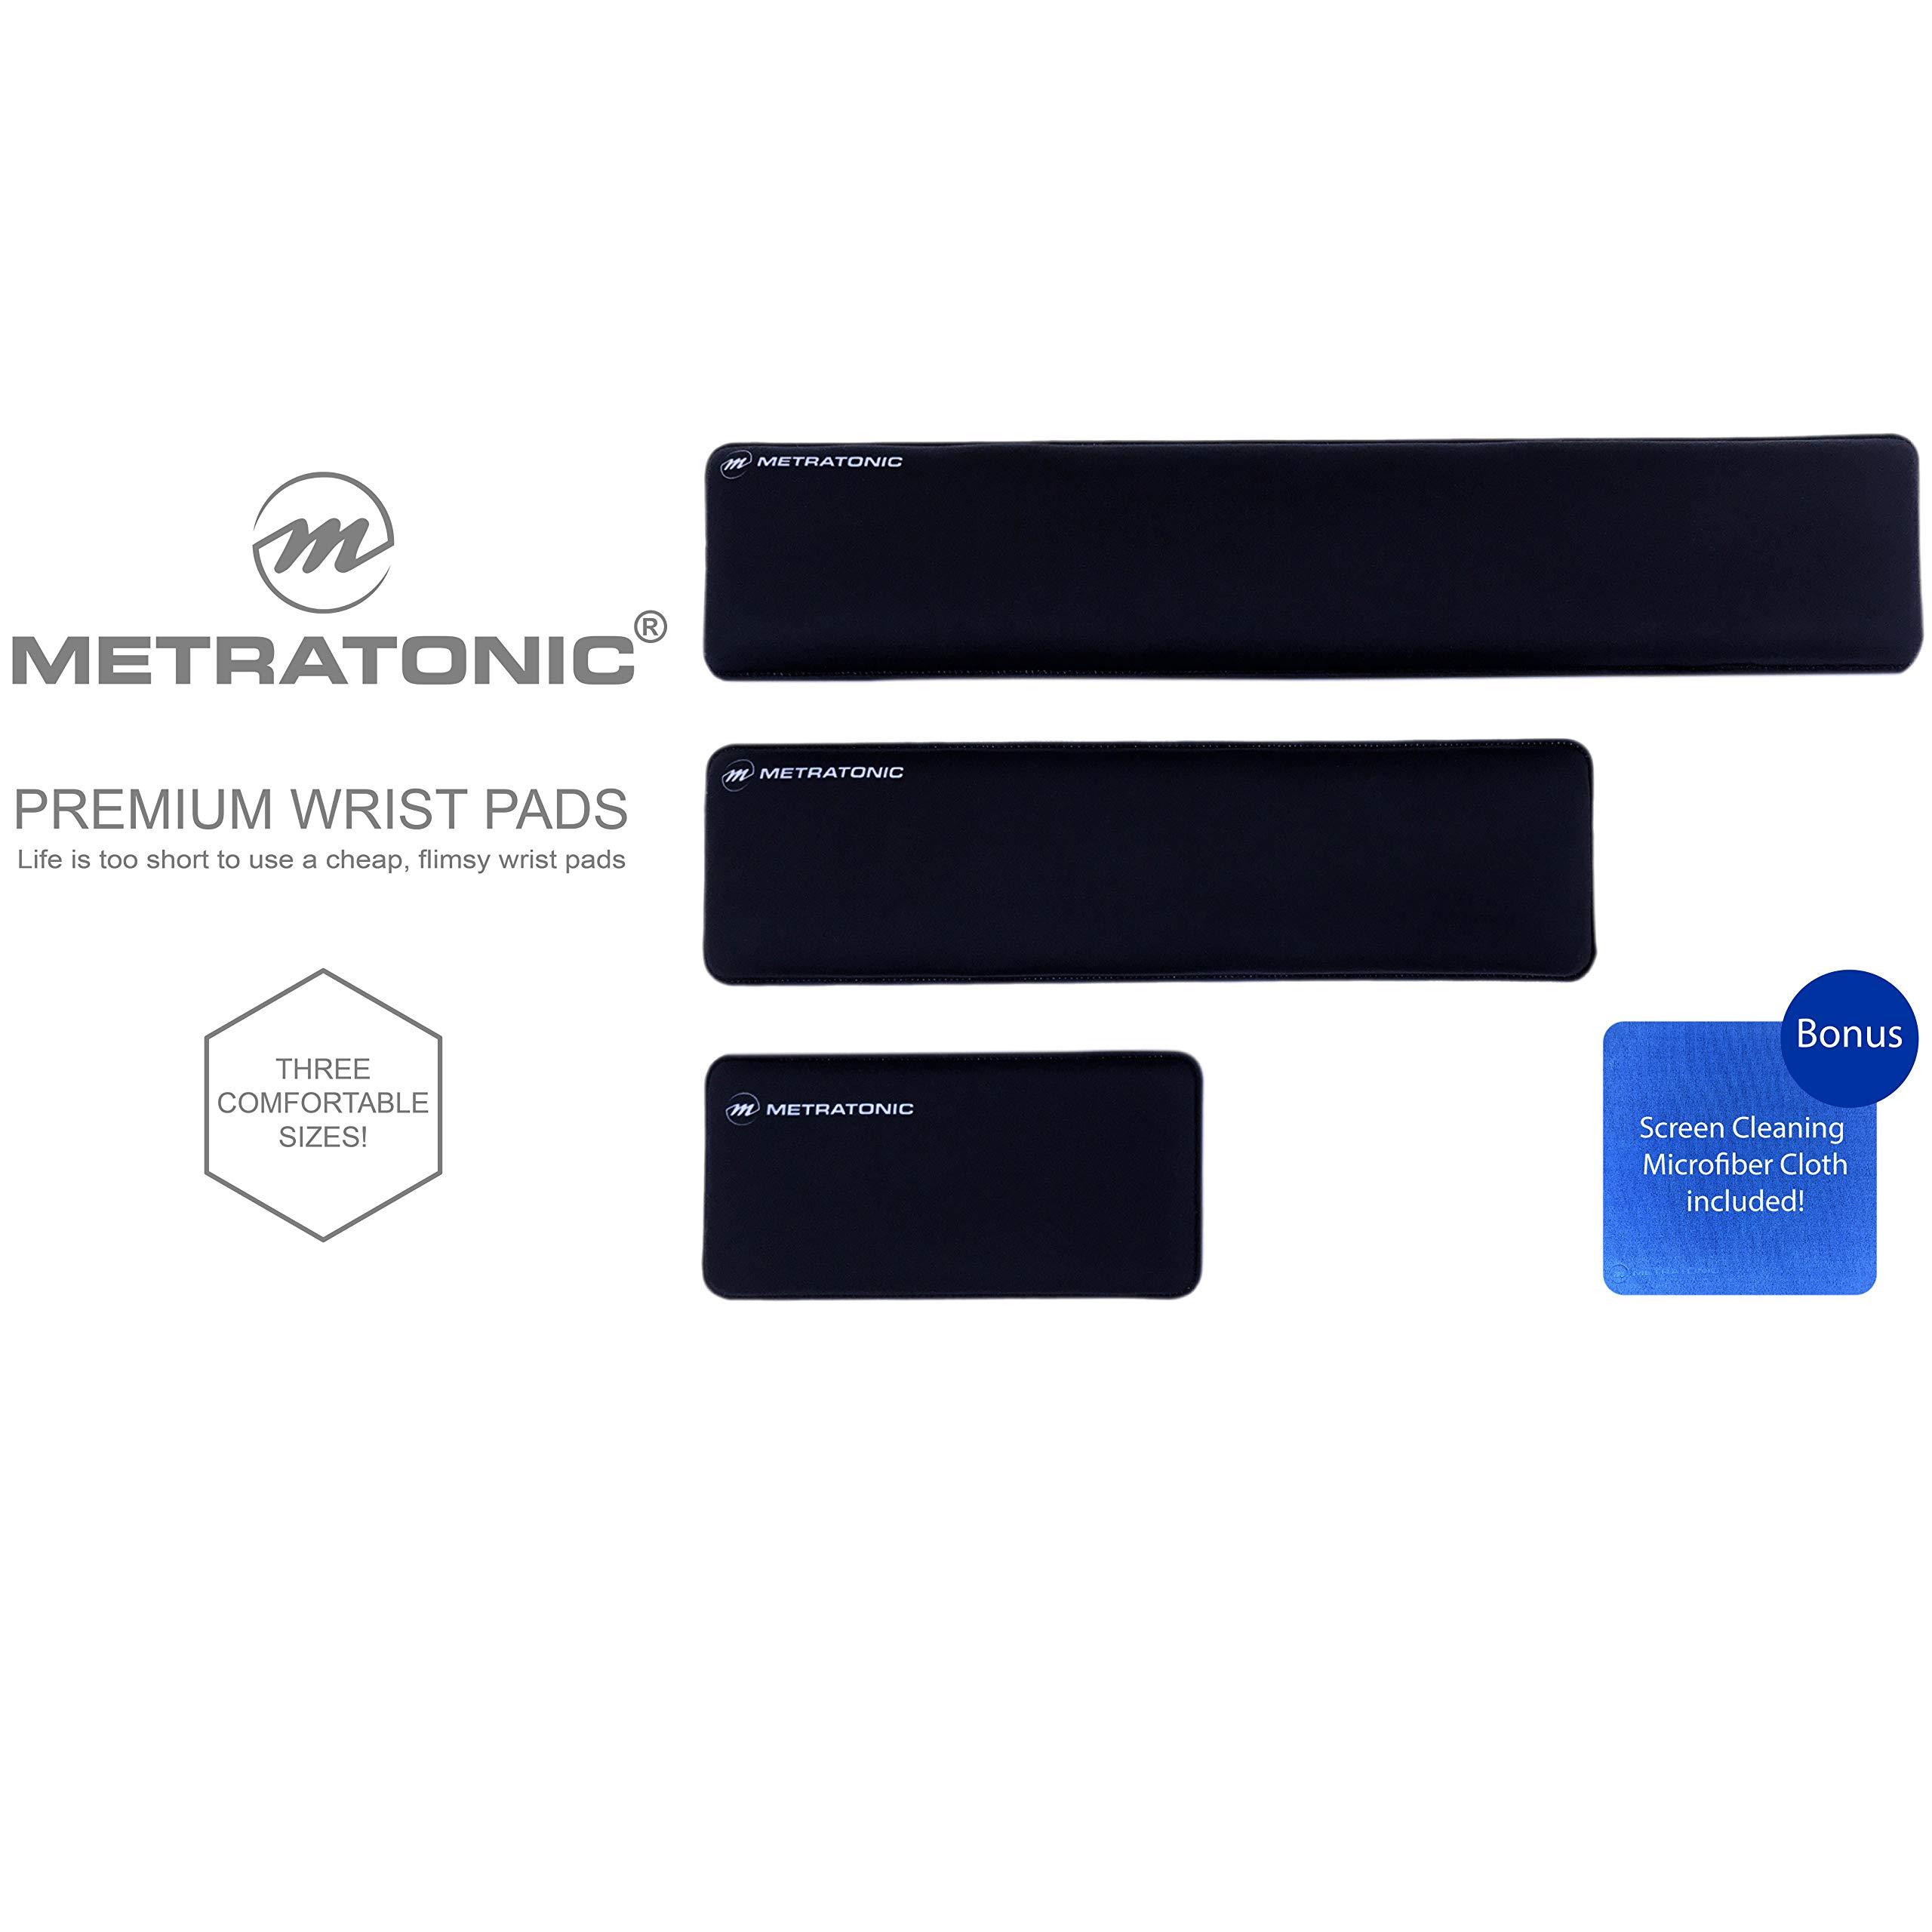 "XL Keyboard Wrist Rest/Wrist Pad, TENKEYLESS 14.5"" Long x 4"" Wide x 1"" Thick Padded Water Resistant, Ergonomic Memory Foam Gel, Anti-Fray Stitched Edges, Anti-Slip Rubber Base, Black | by Metratonic by Metratonic (Image #9)"